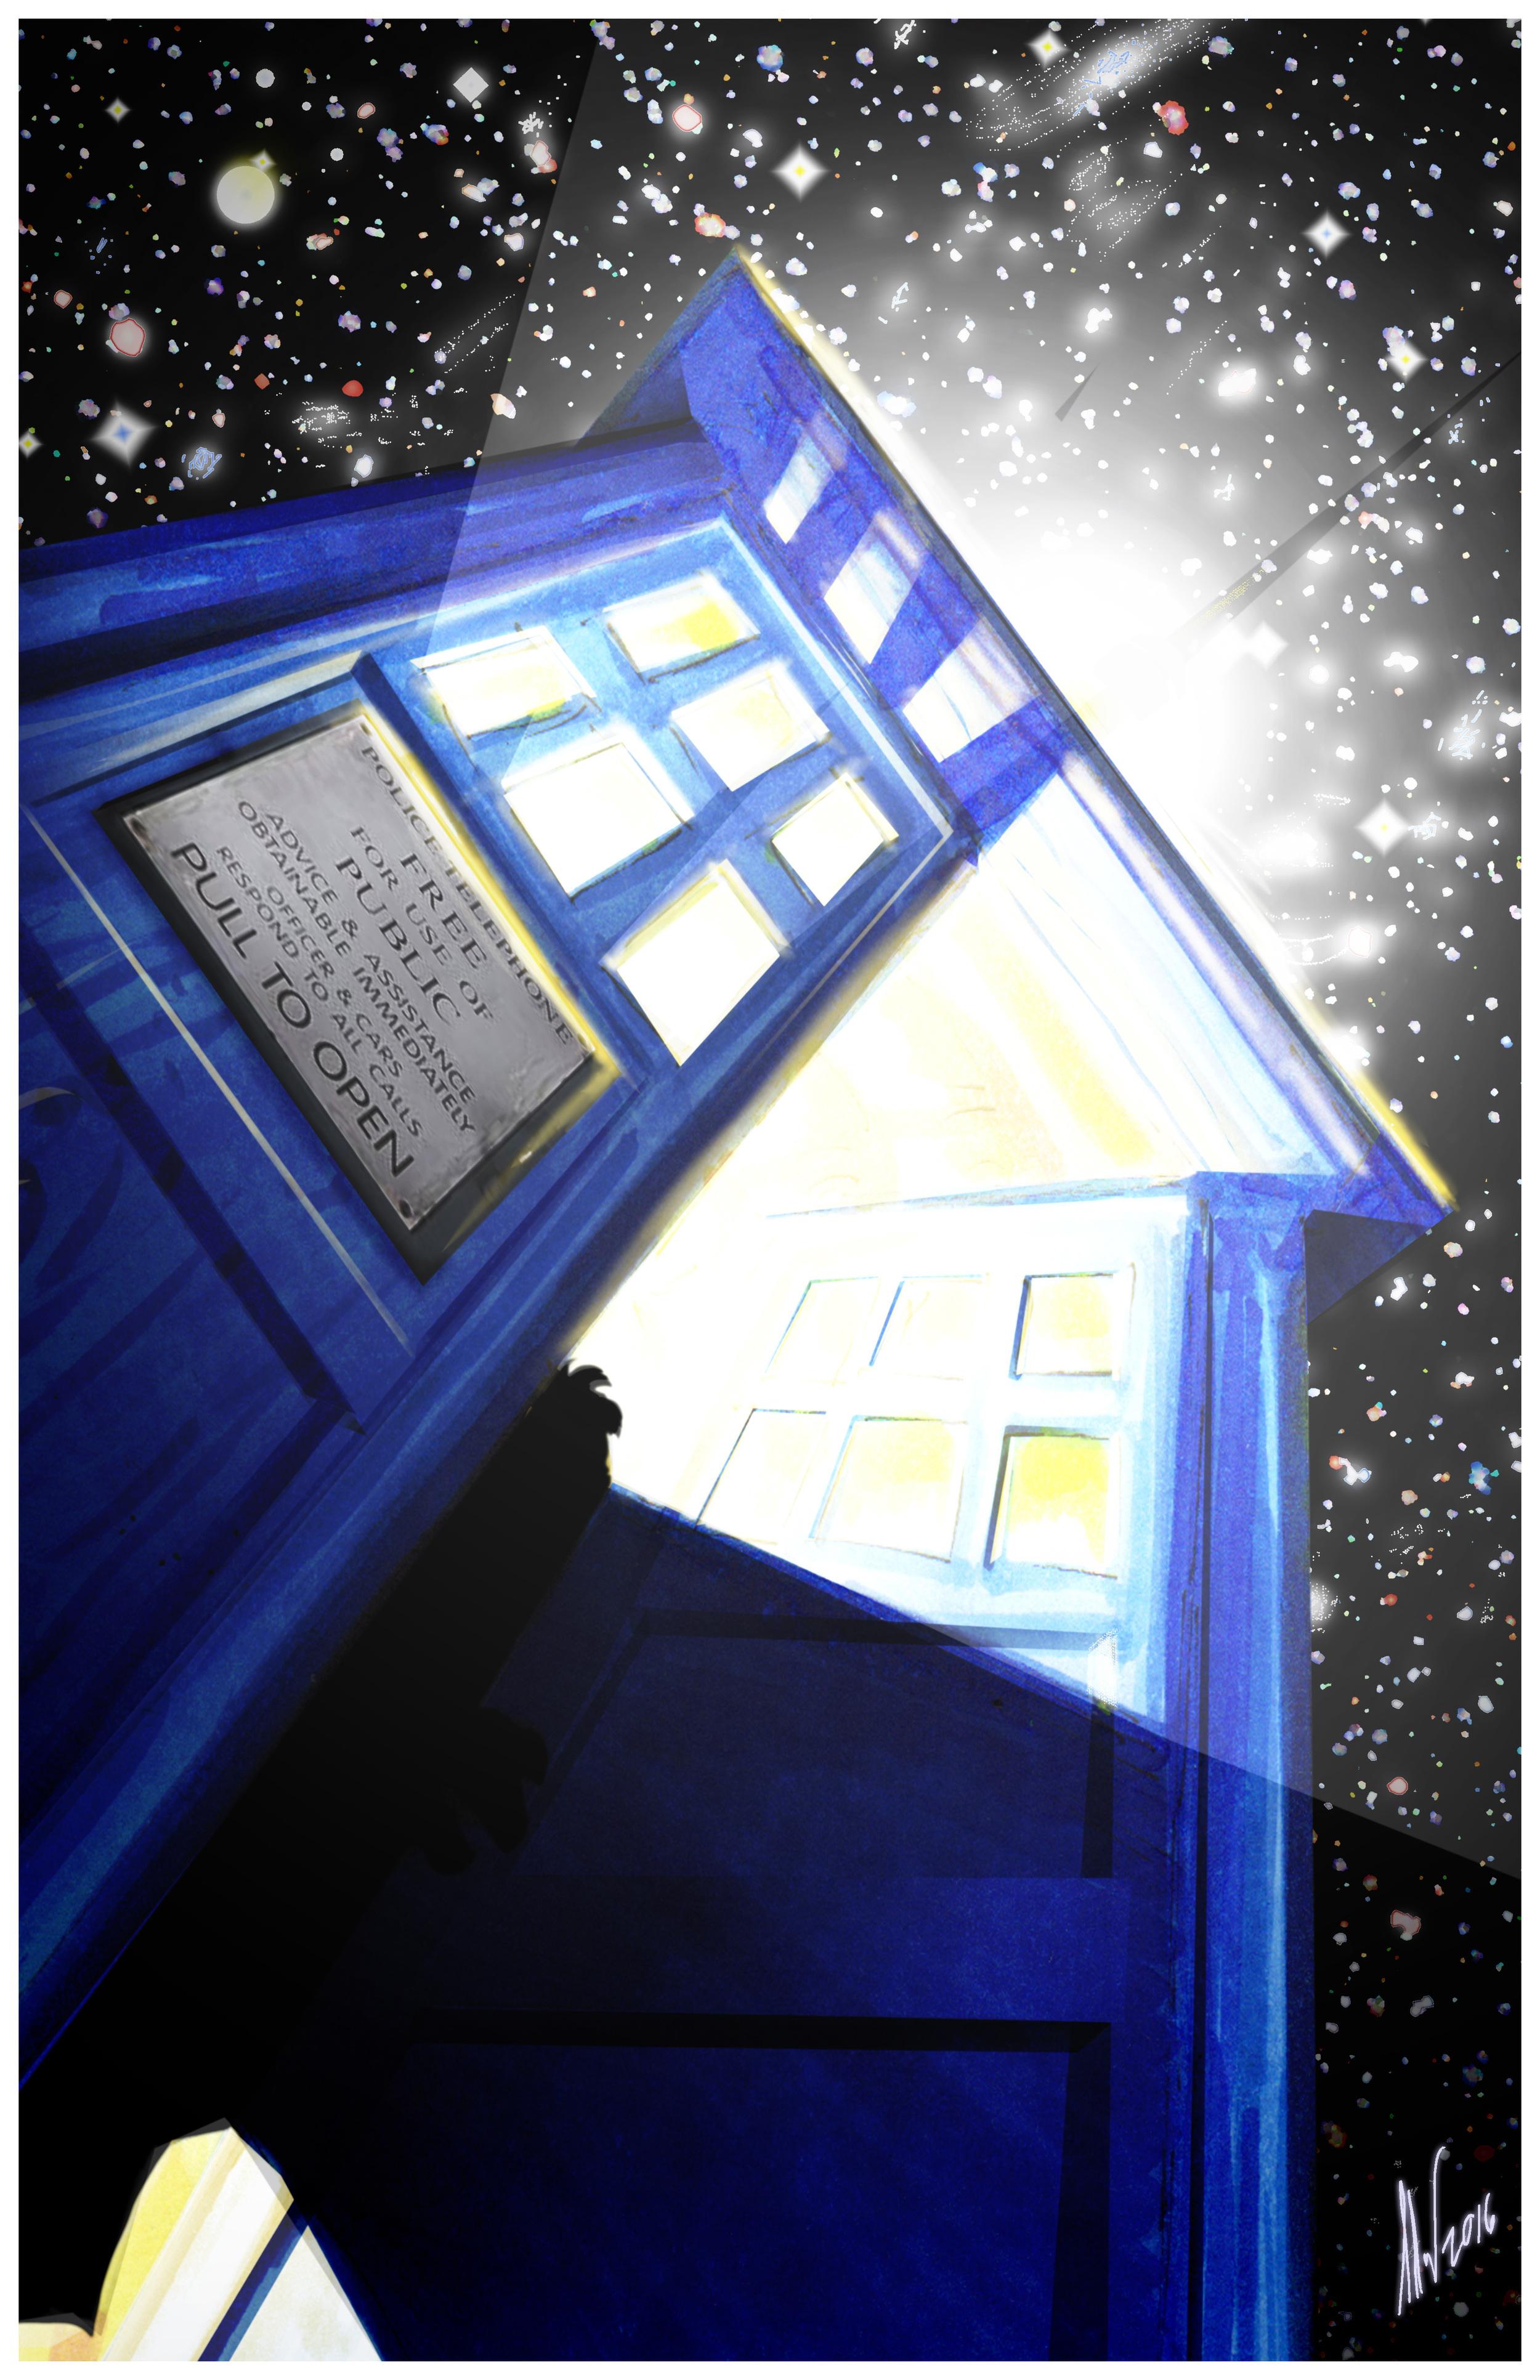 Doctor Who-Tardis 11x17.jpg